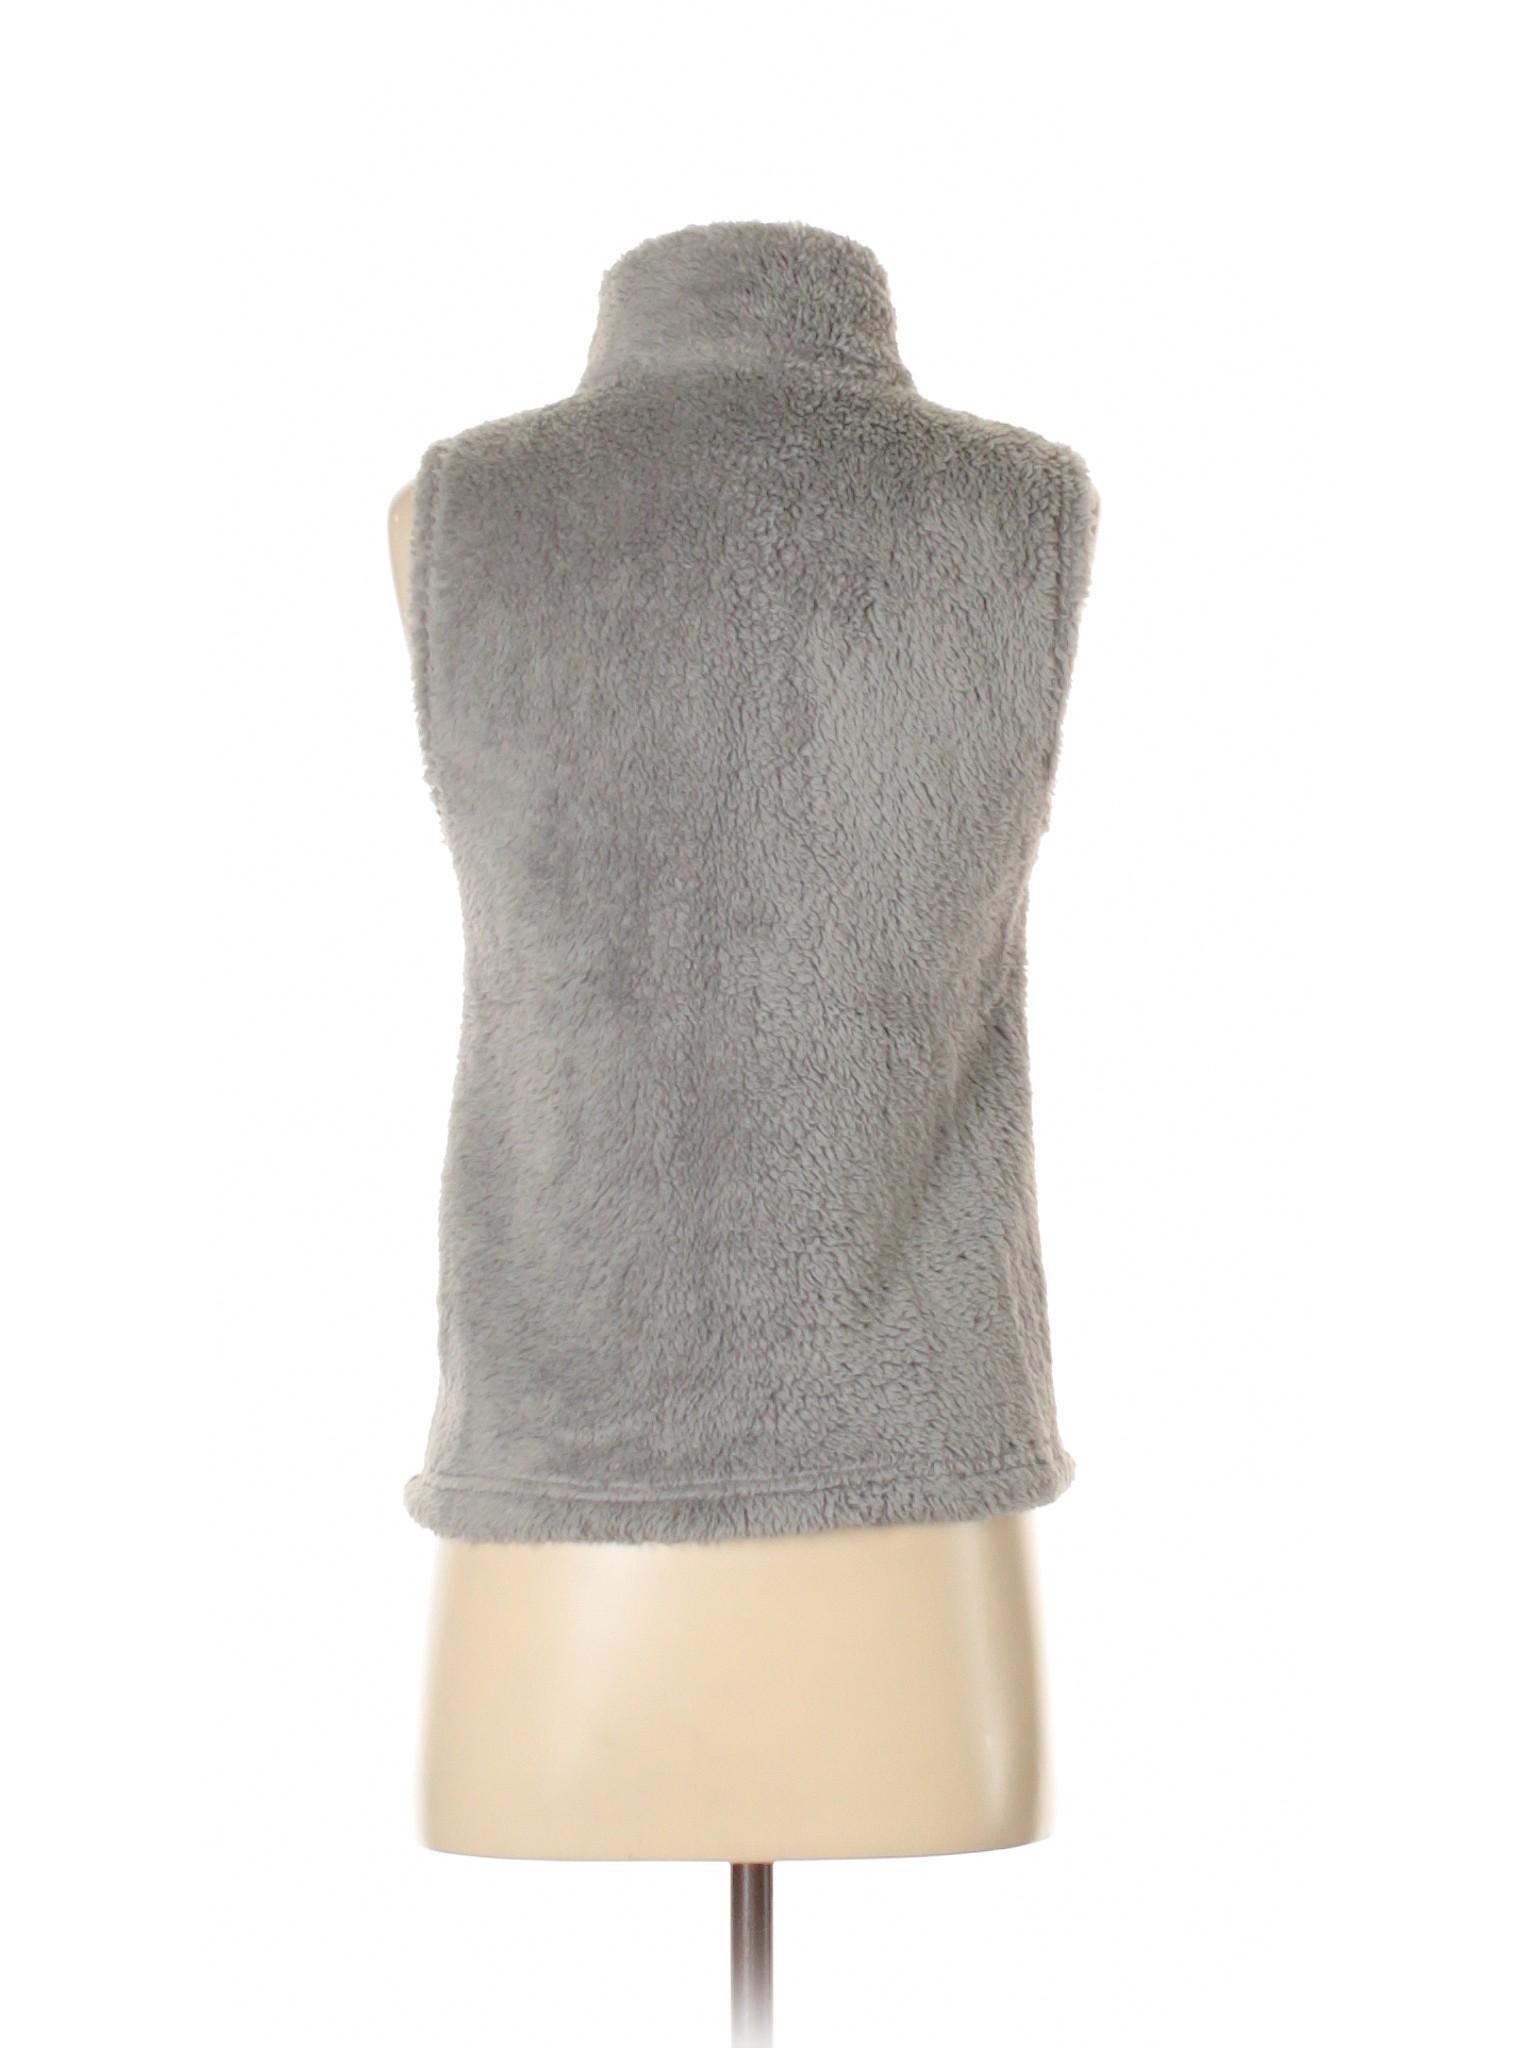 Vest Life Boutique Style Sonoma Winter wppq0IHC